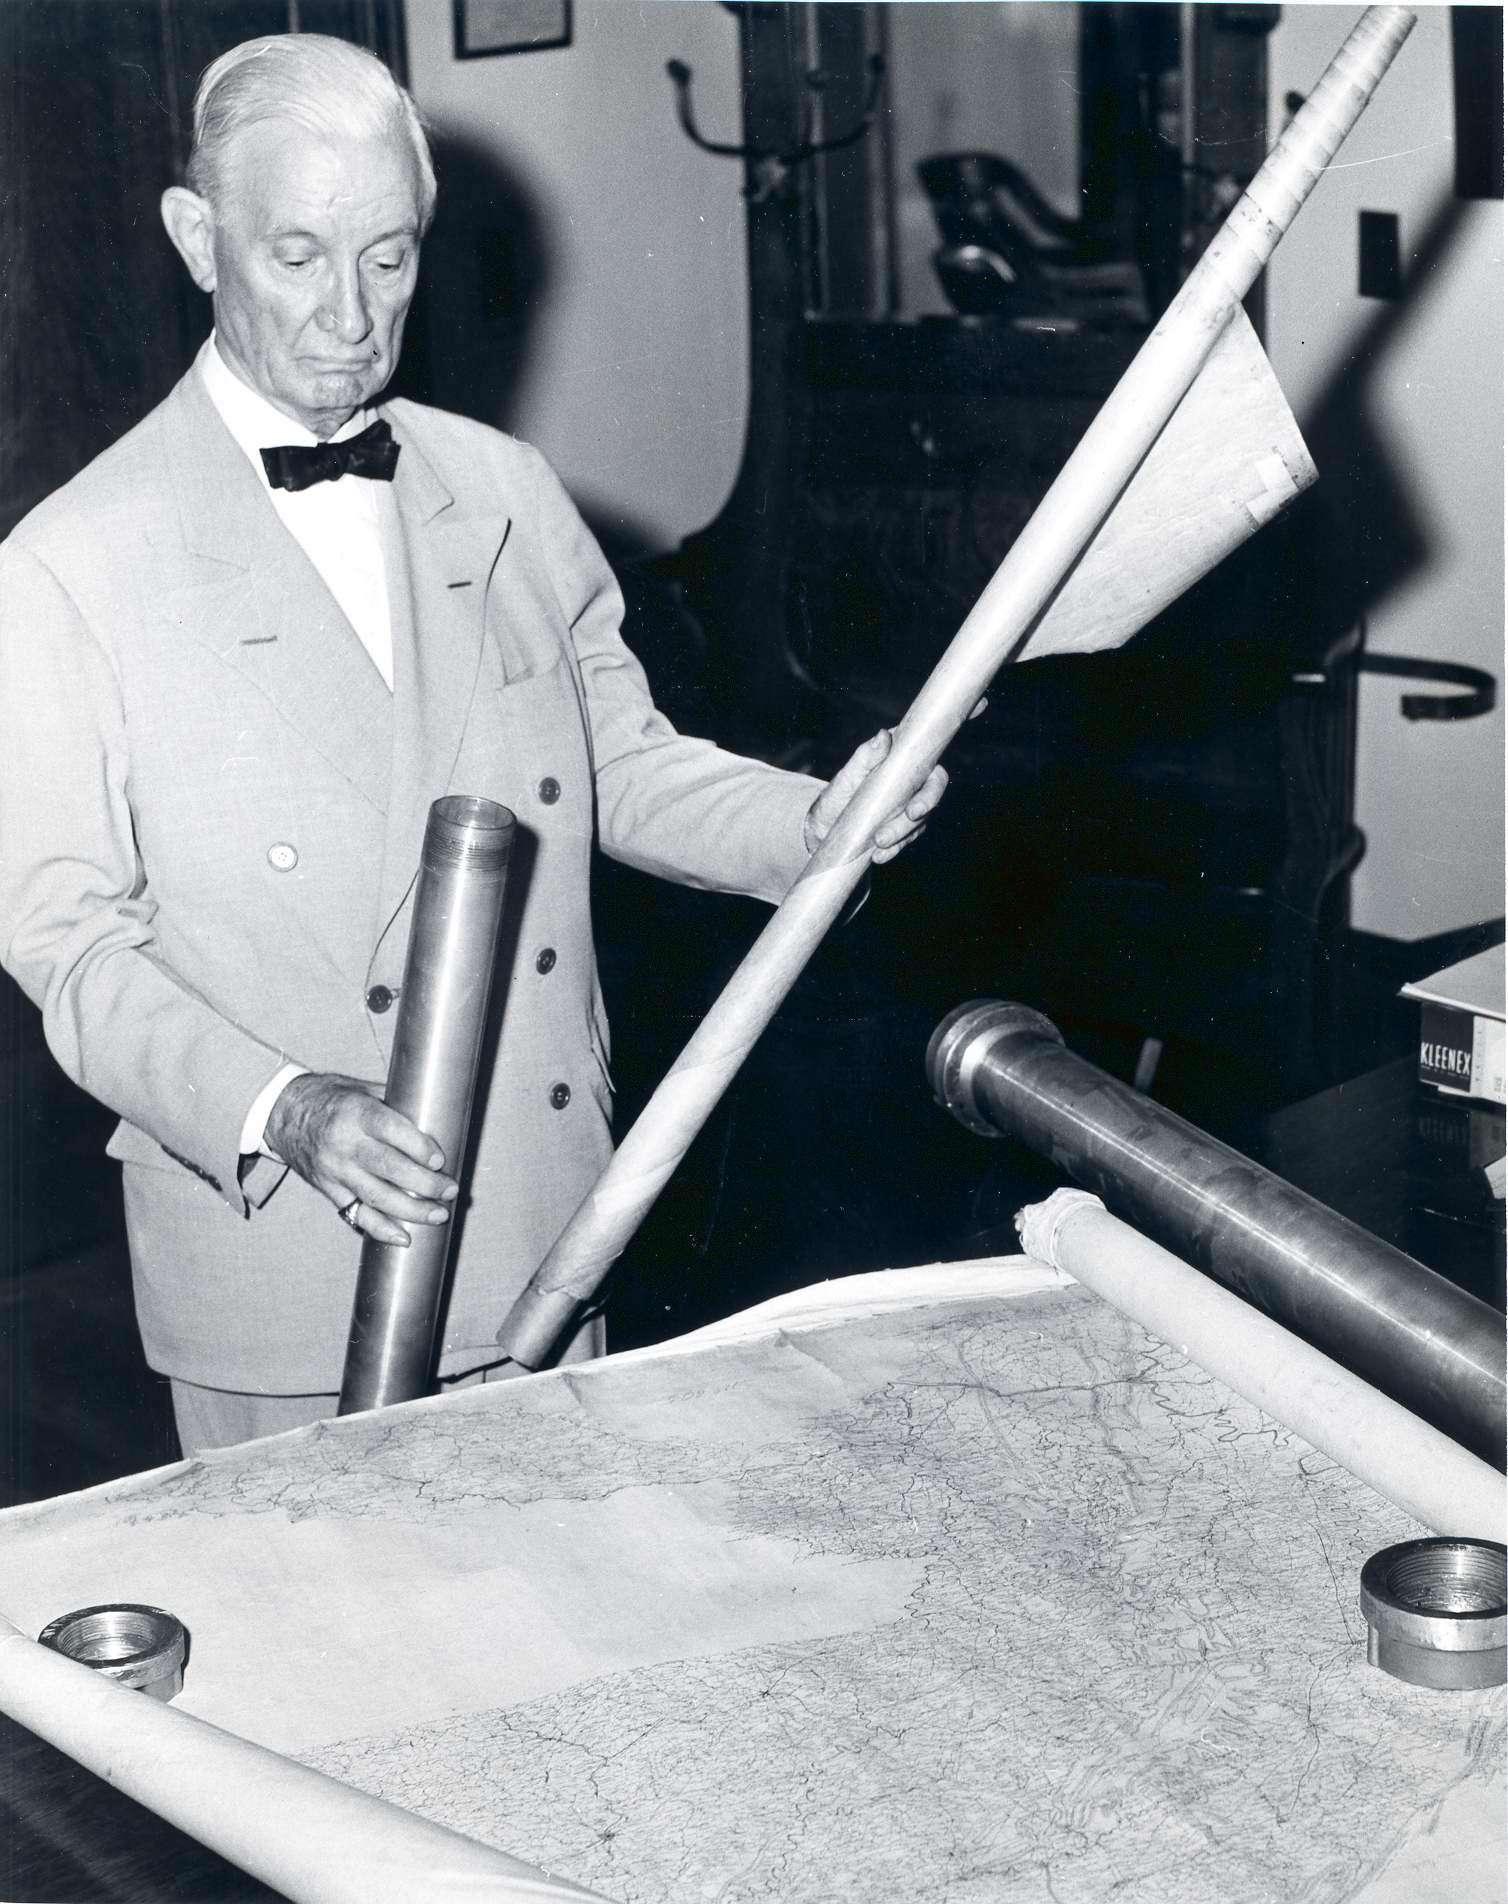 C. Vernon Eddy